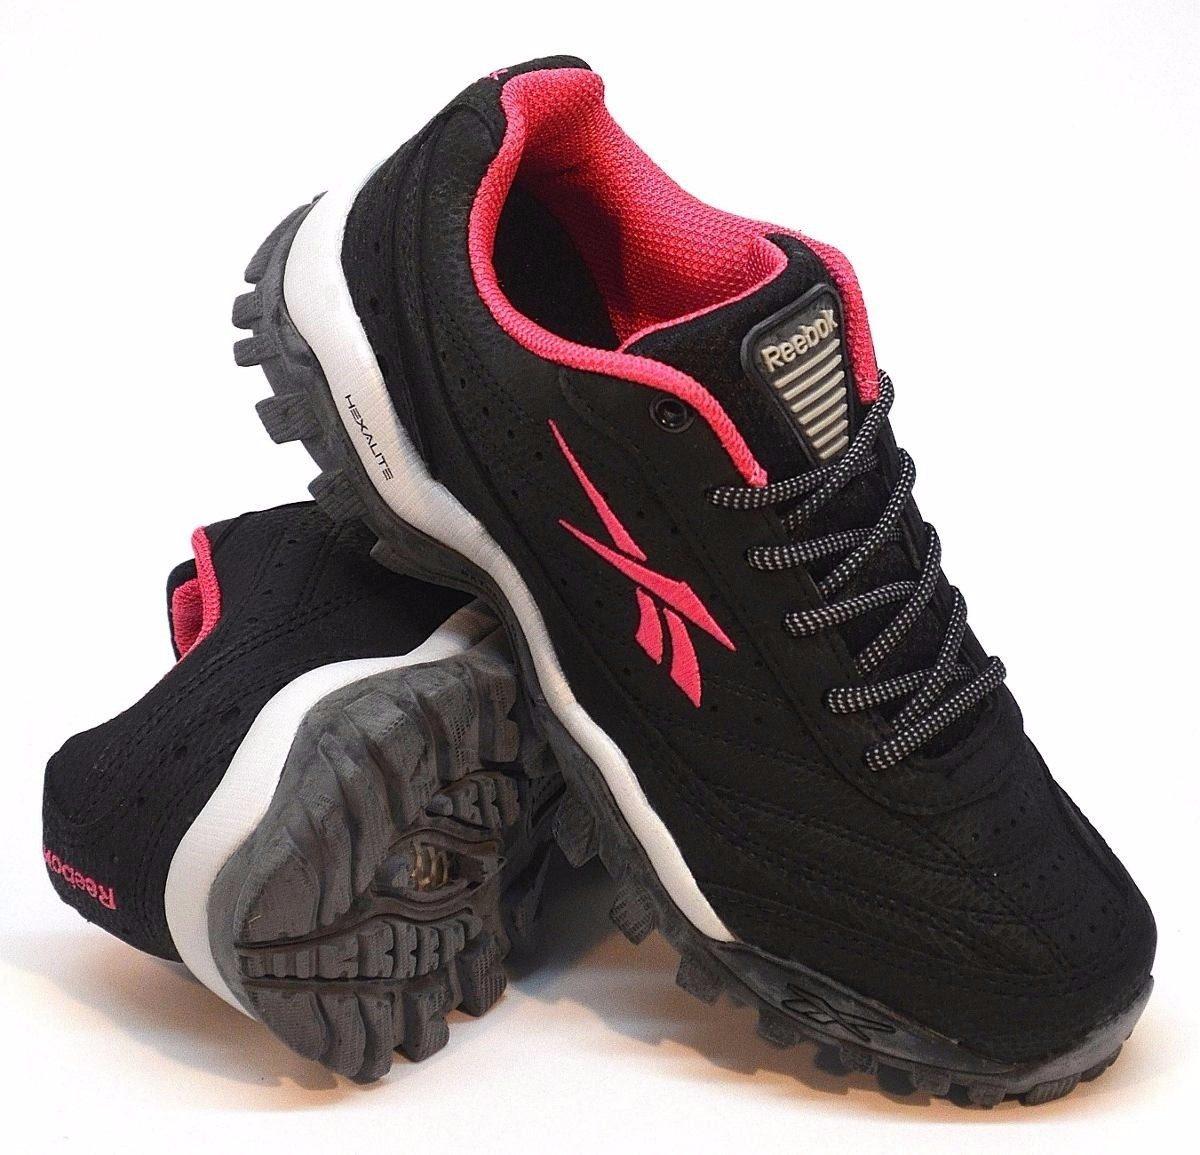 ffd3c61186125 zapatillas reebok línea trekking damas modelo cross city. Cargando zoom.